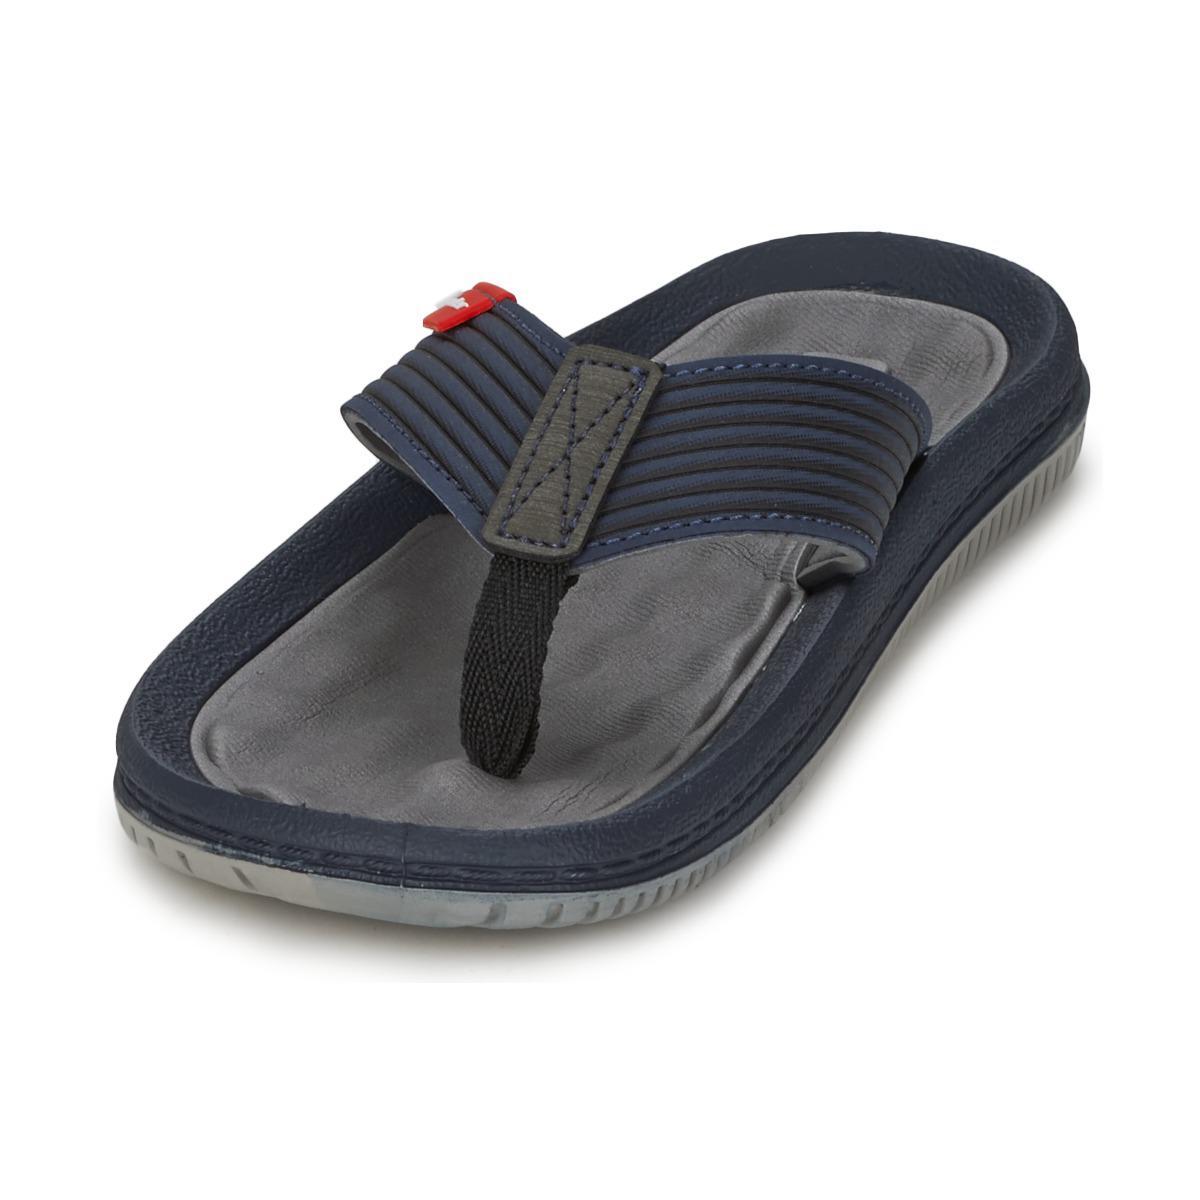 c3829a9c6907 Rider Dunas Vi Ad Men s Flip Flops   Sandals (shoes) In Grey in Gray ...